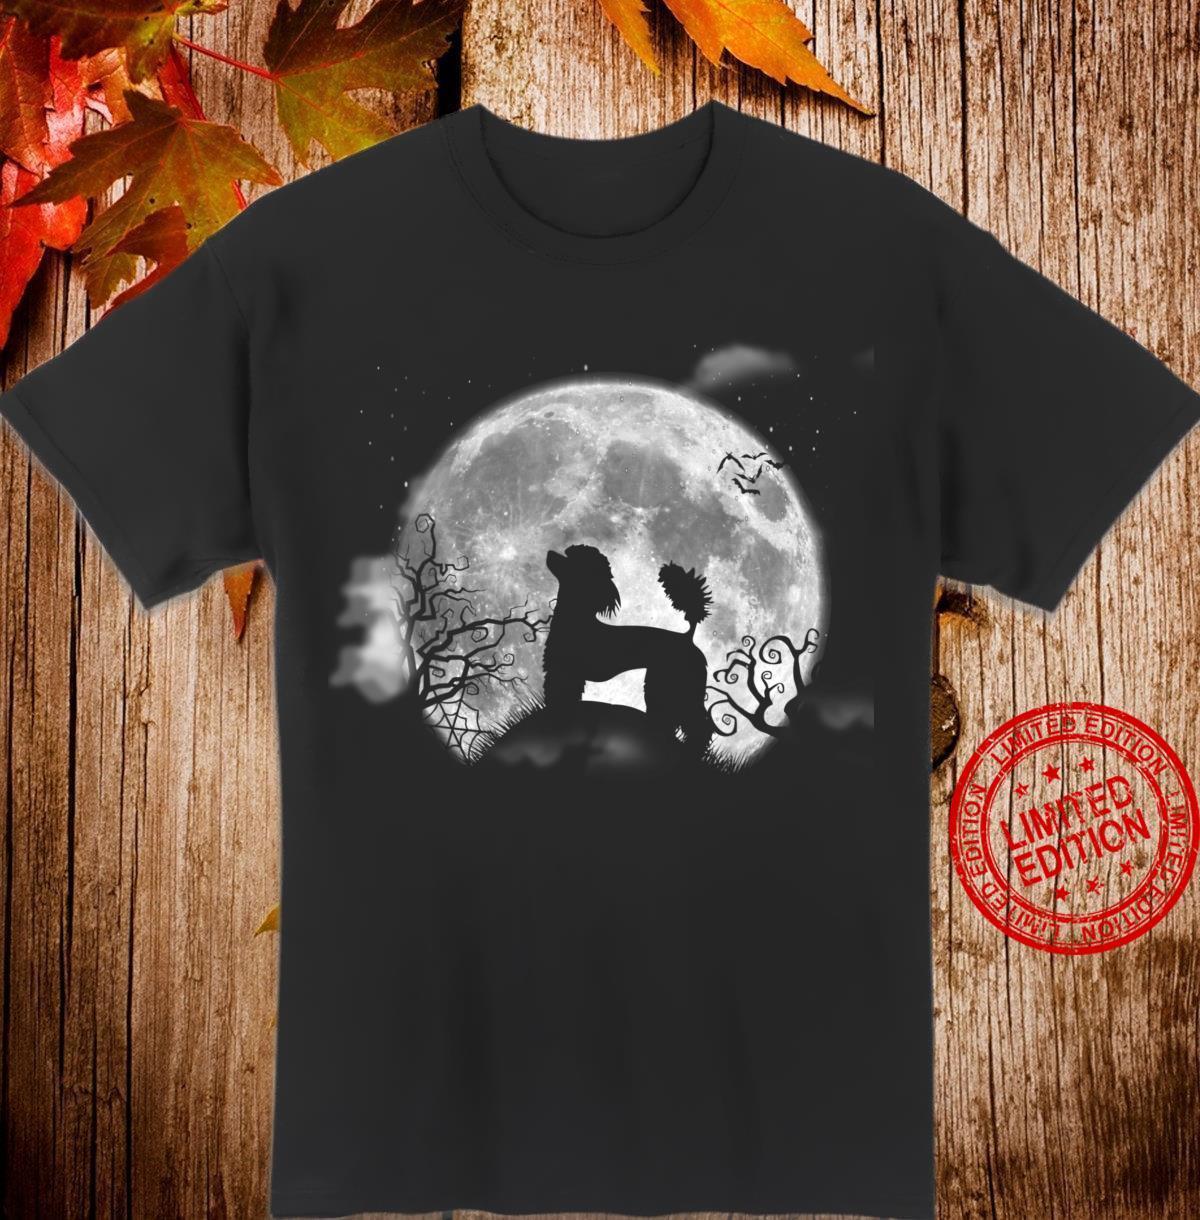 Funny Poodle Halloween Costume Shirt Dog Shirt